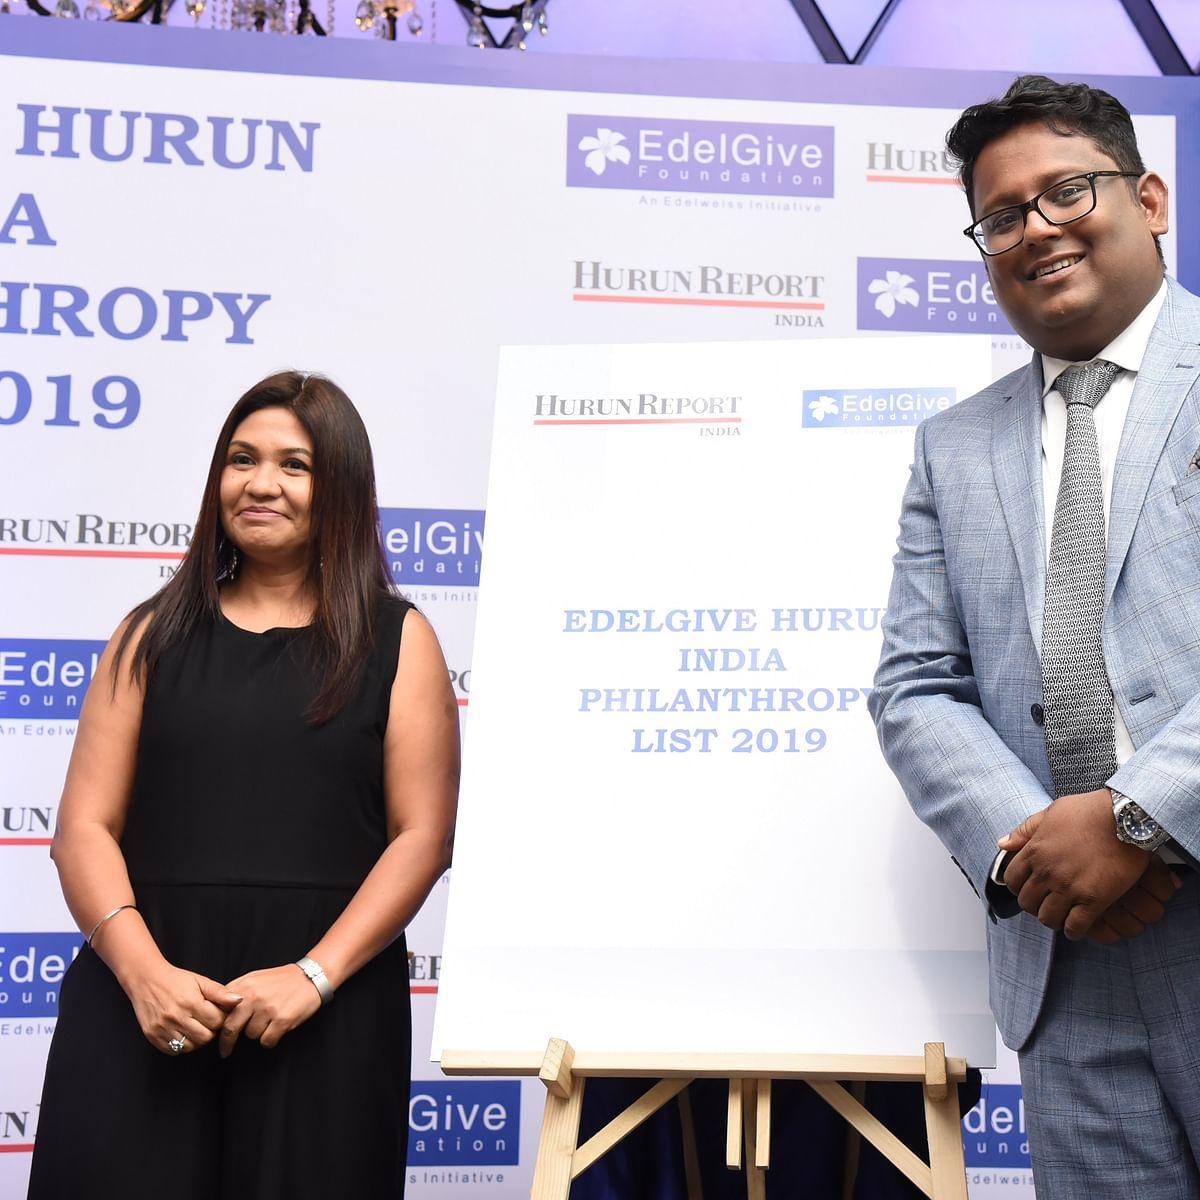 Shiv Nadar, Azim Premji and Mukesh Ambani are the top three of EdelGive Hurun India Philanthropy list 2019